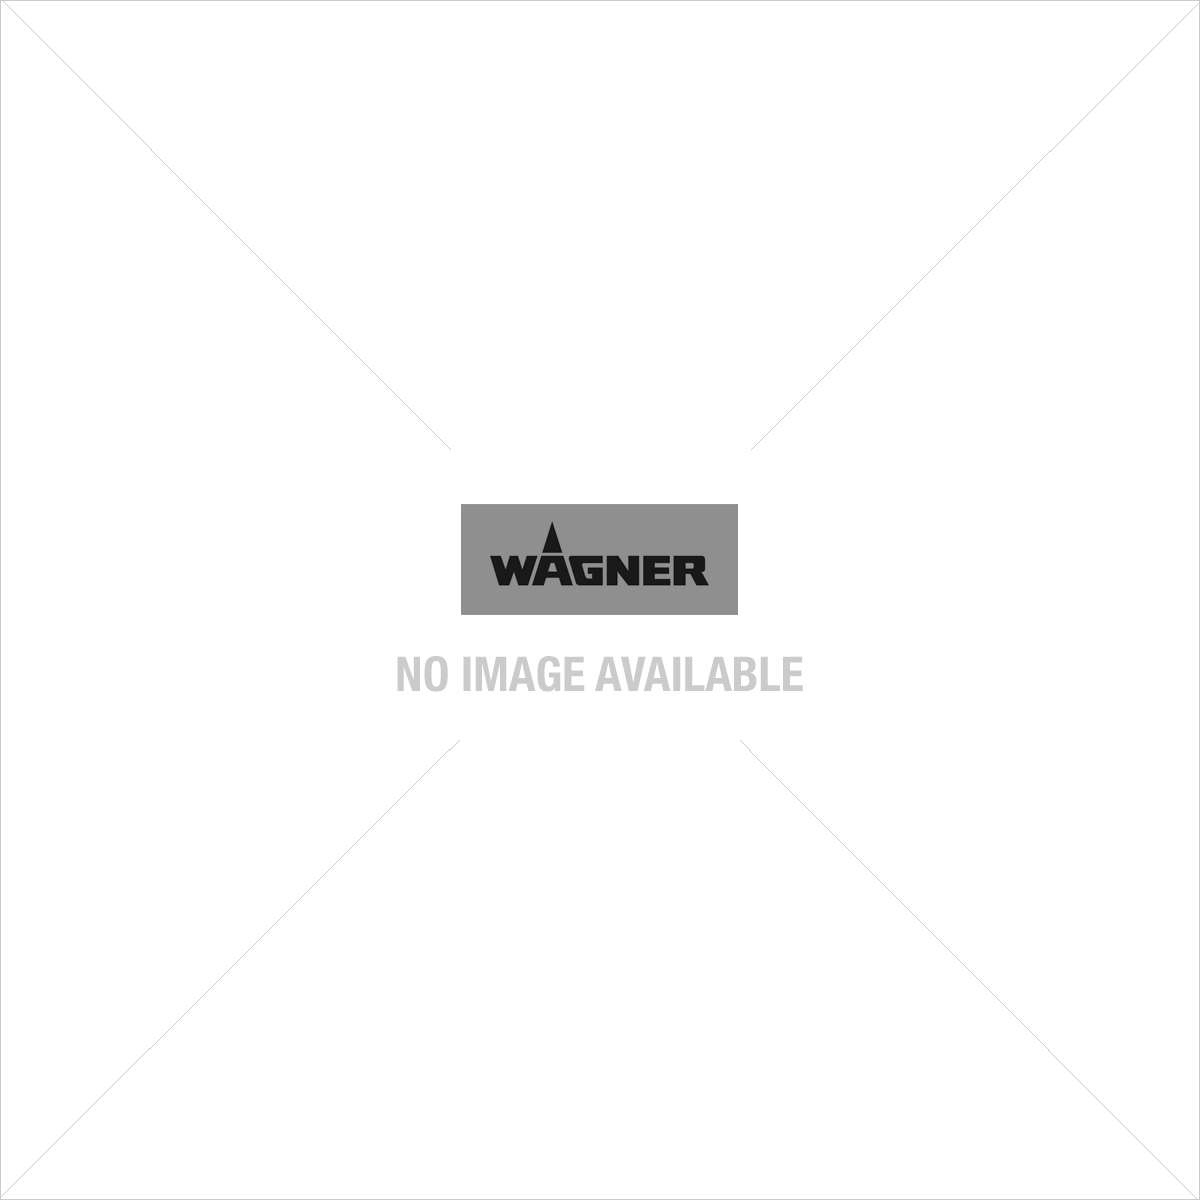 Düse L 517 Wagner airless